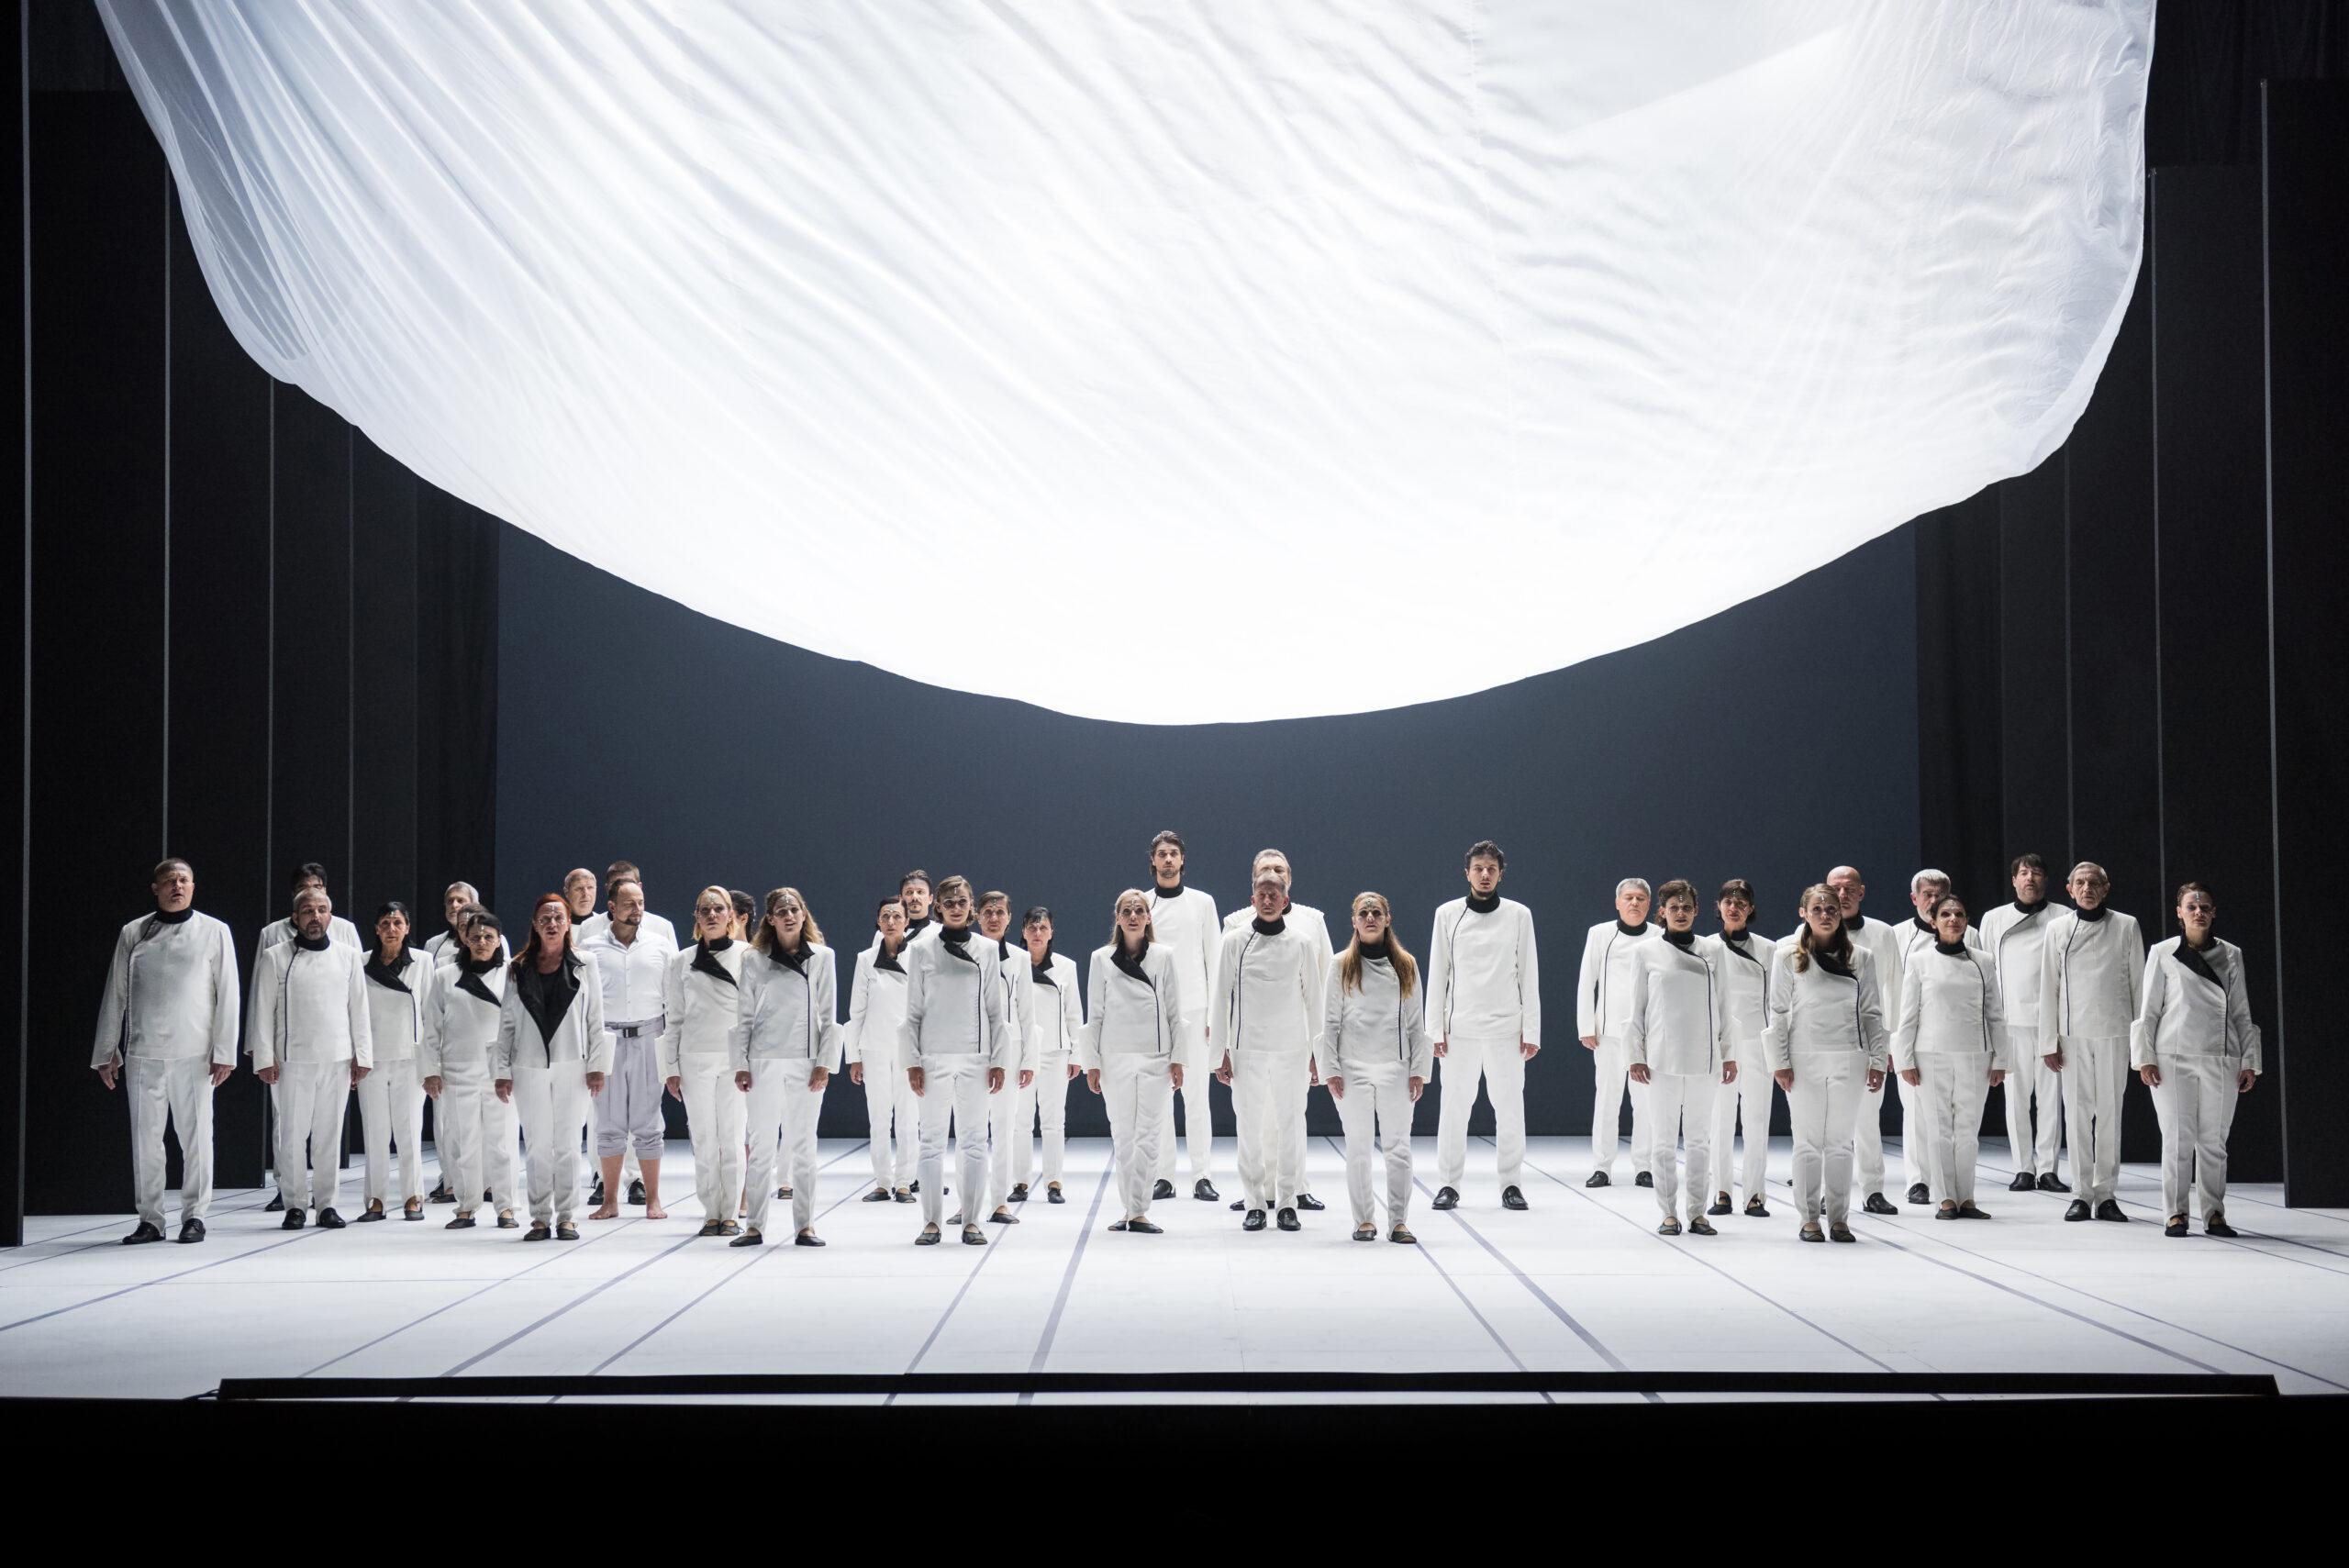 Mankica Kranjec, Slovenia: A Story of the Magic Flute, 2019, Choir of the Slovenian National Theatre Opera and Ballet Ljubljana, Slovenia - Final group scene on the main stage. W. A. Mozart: The Magic Flute, season 2019/2020.